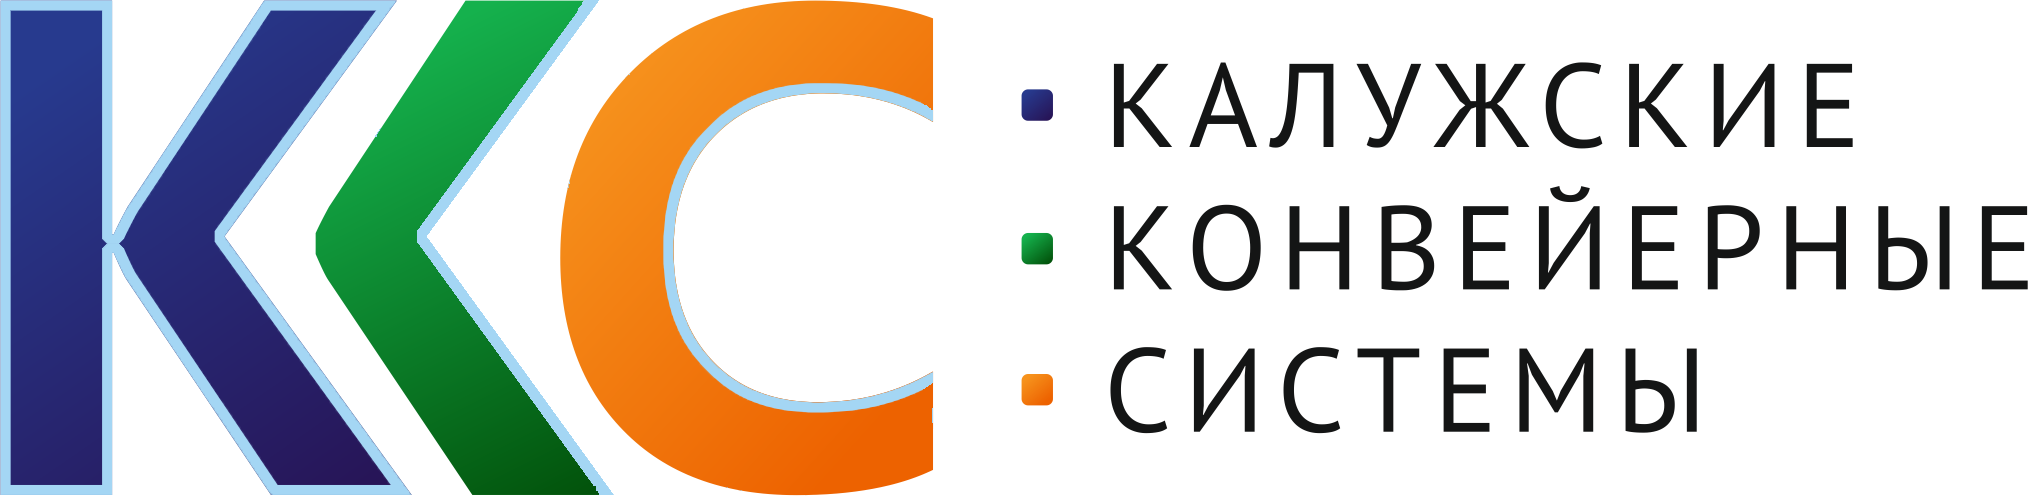 ККС Лого4